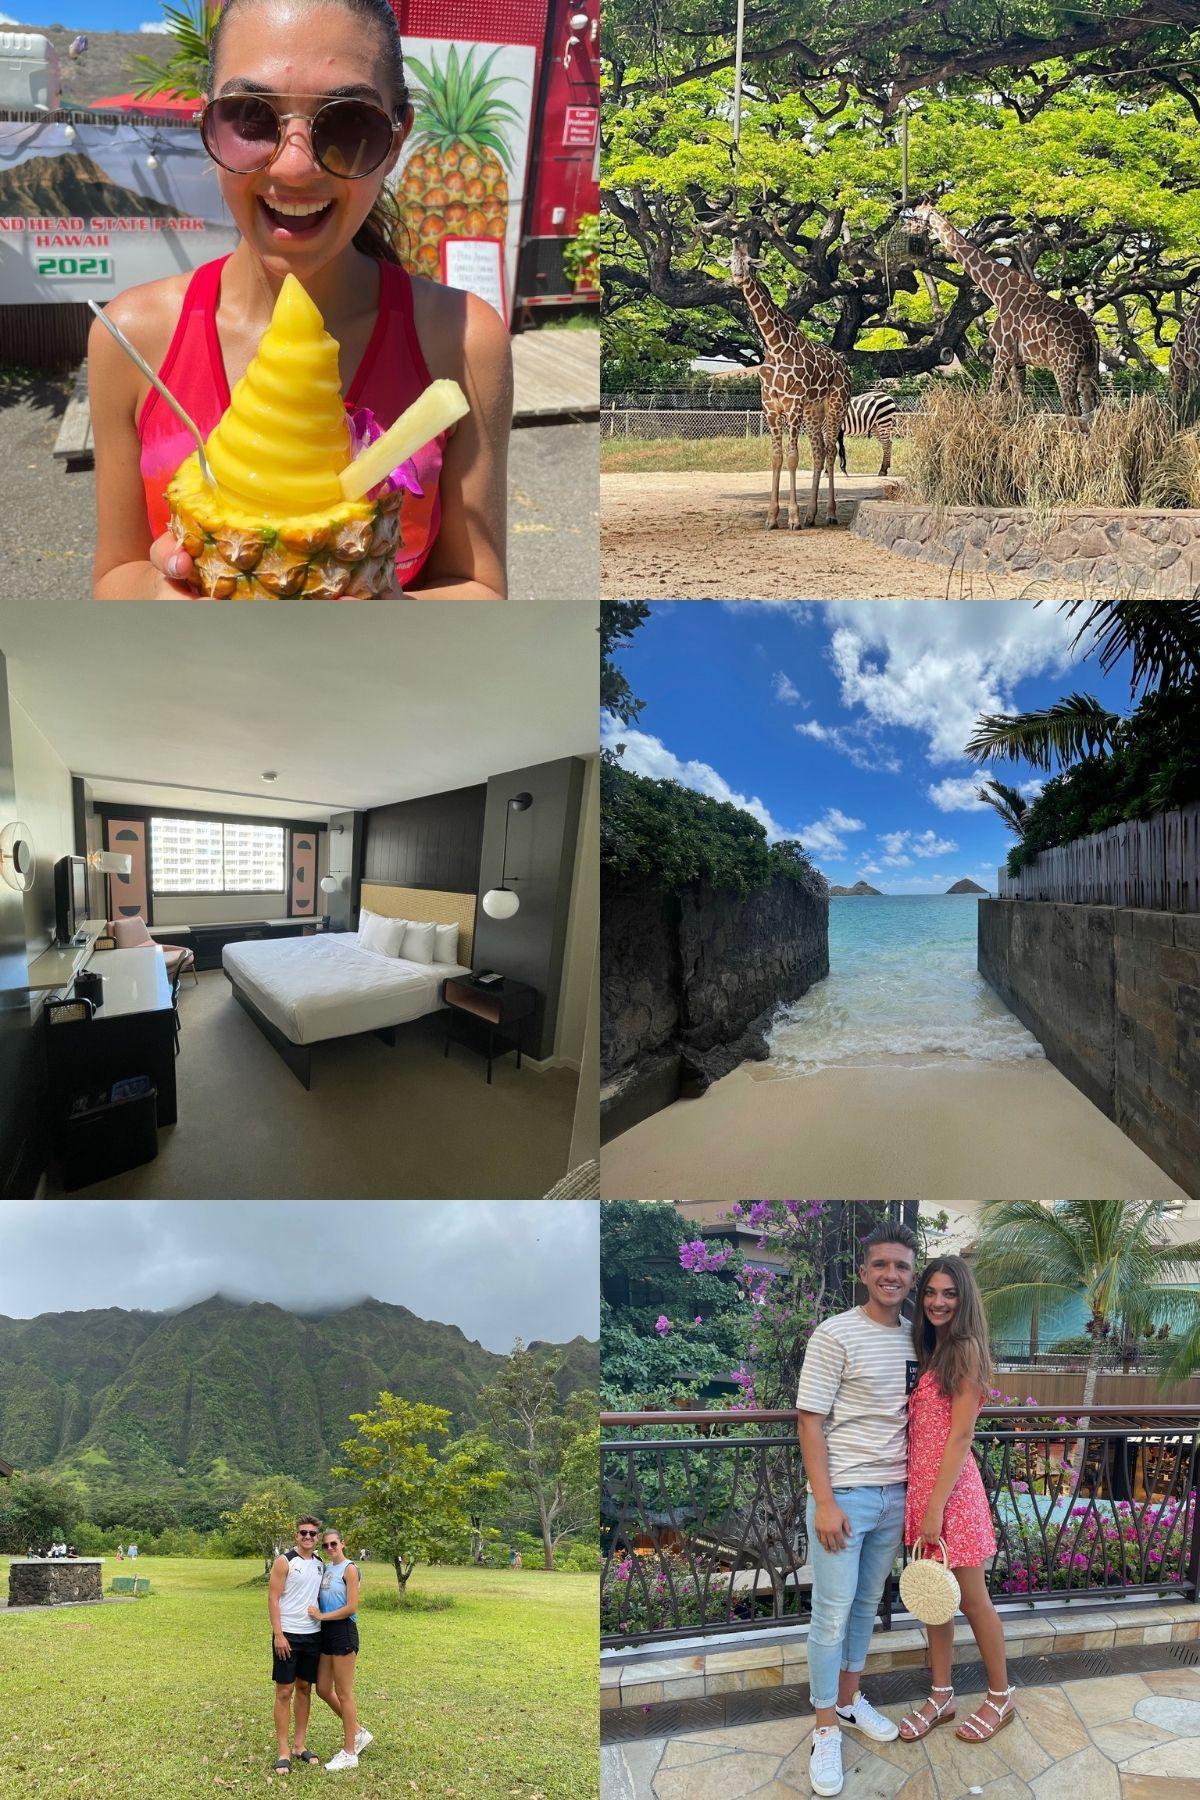 photo collage of hawaii trip